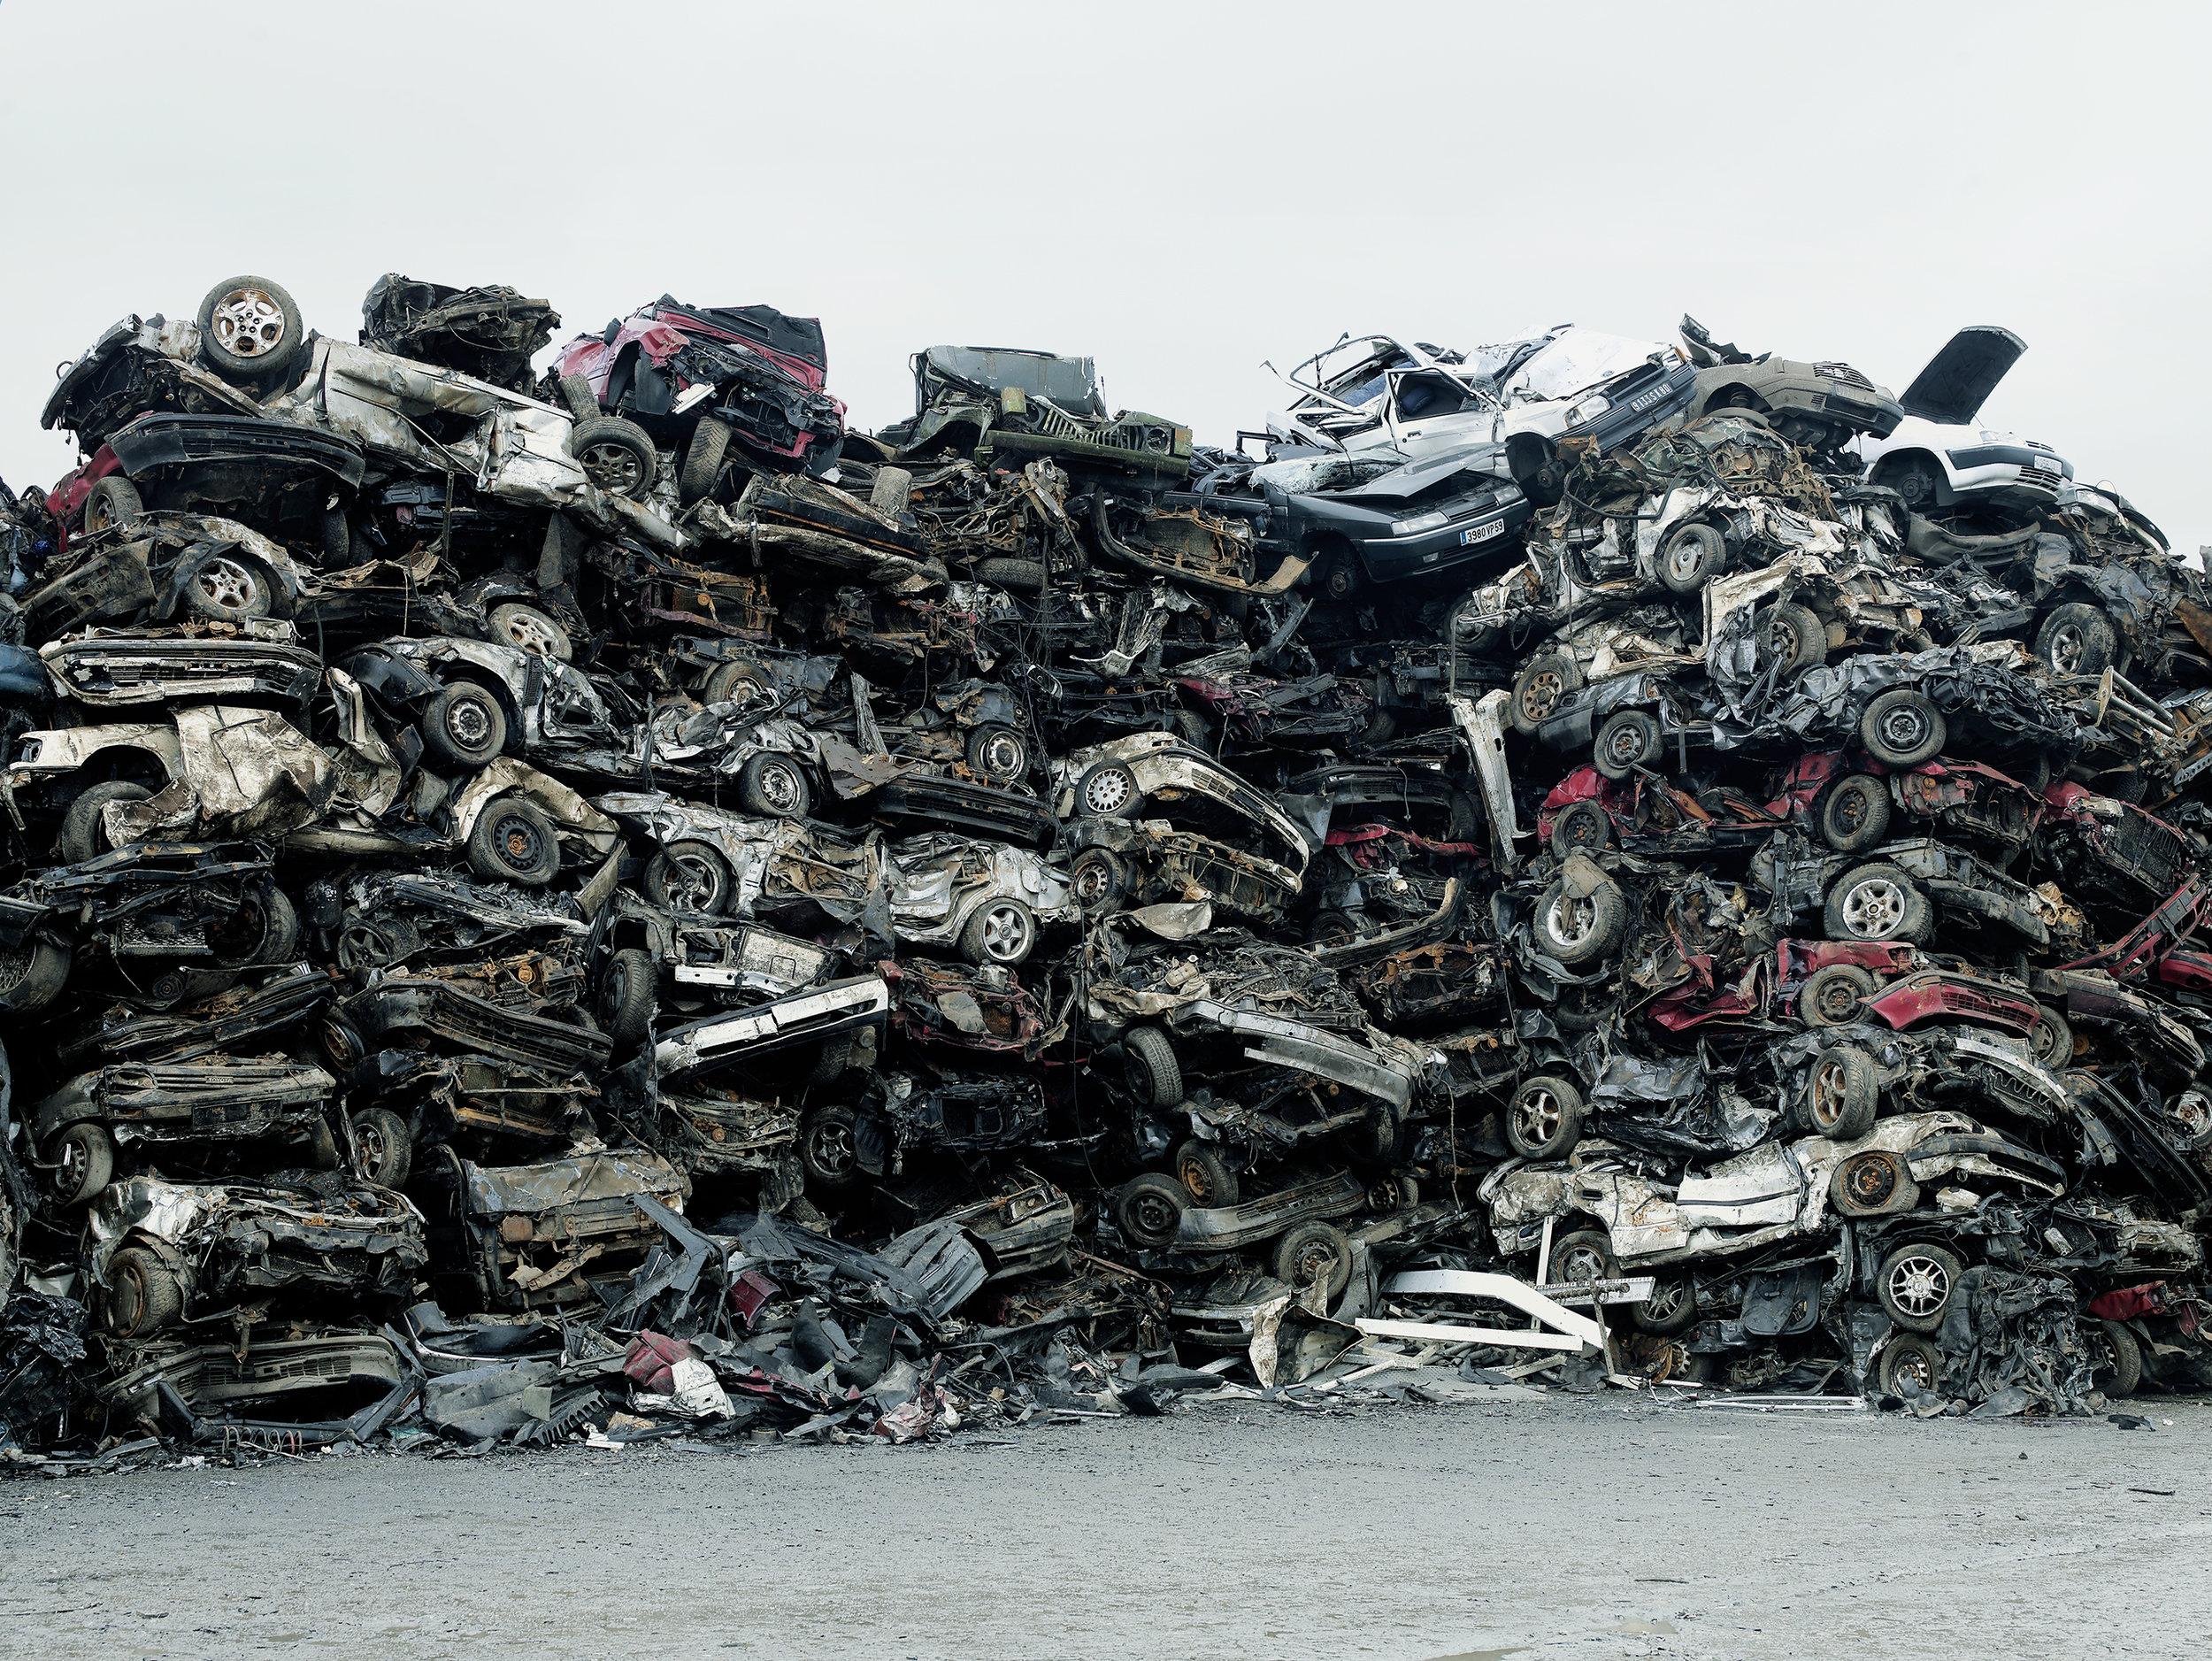 Recycling plant 3, Belgium, 2007.